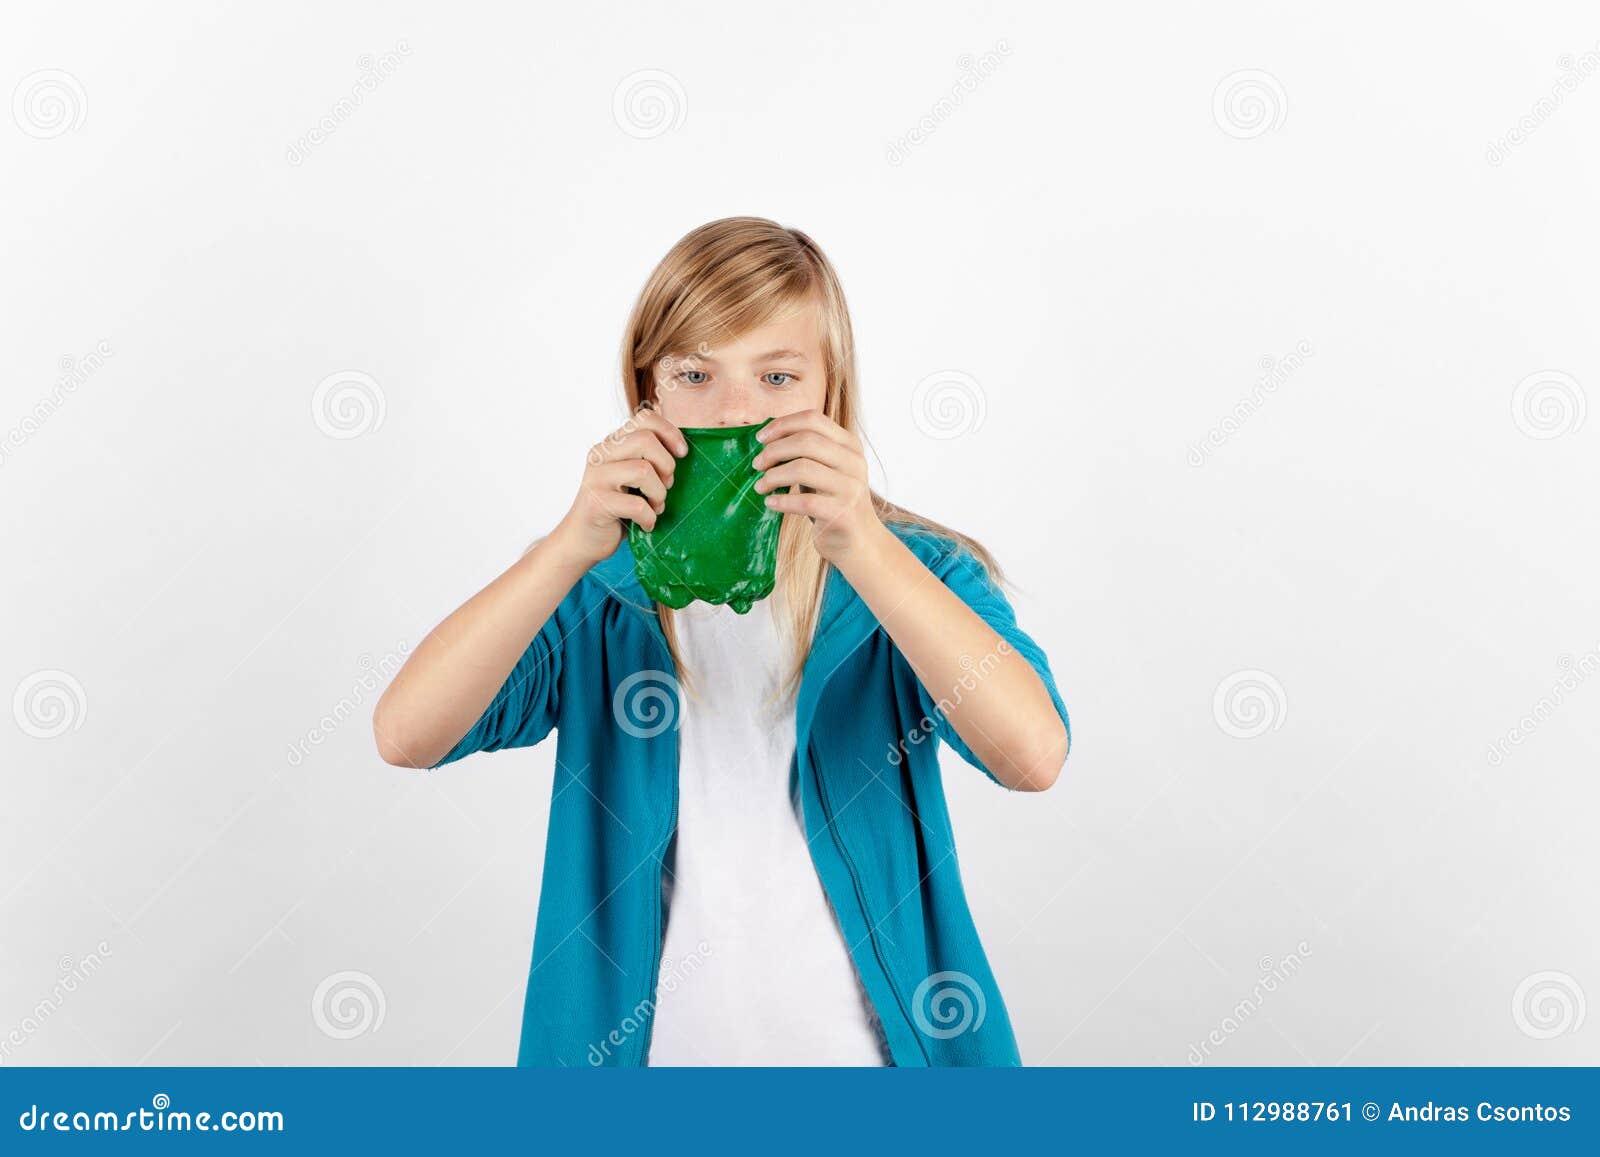 Girl playing with homemade green slime